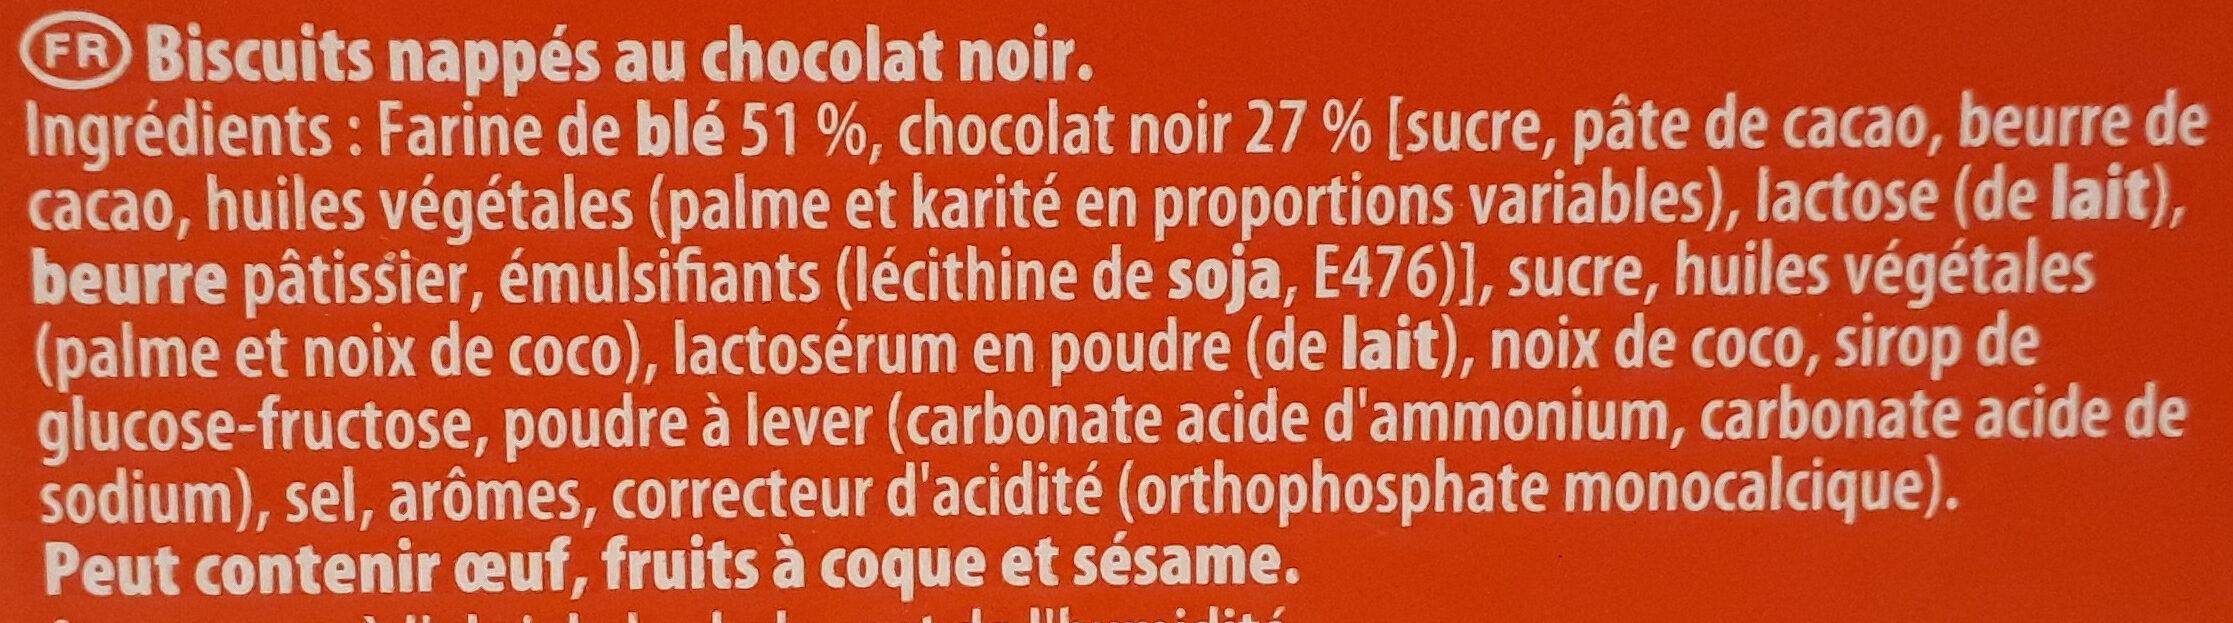 Pépito - Chocolat noir - Ingredienti - fr